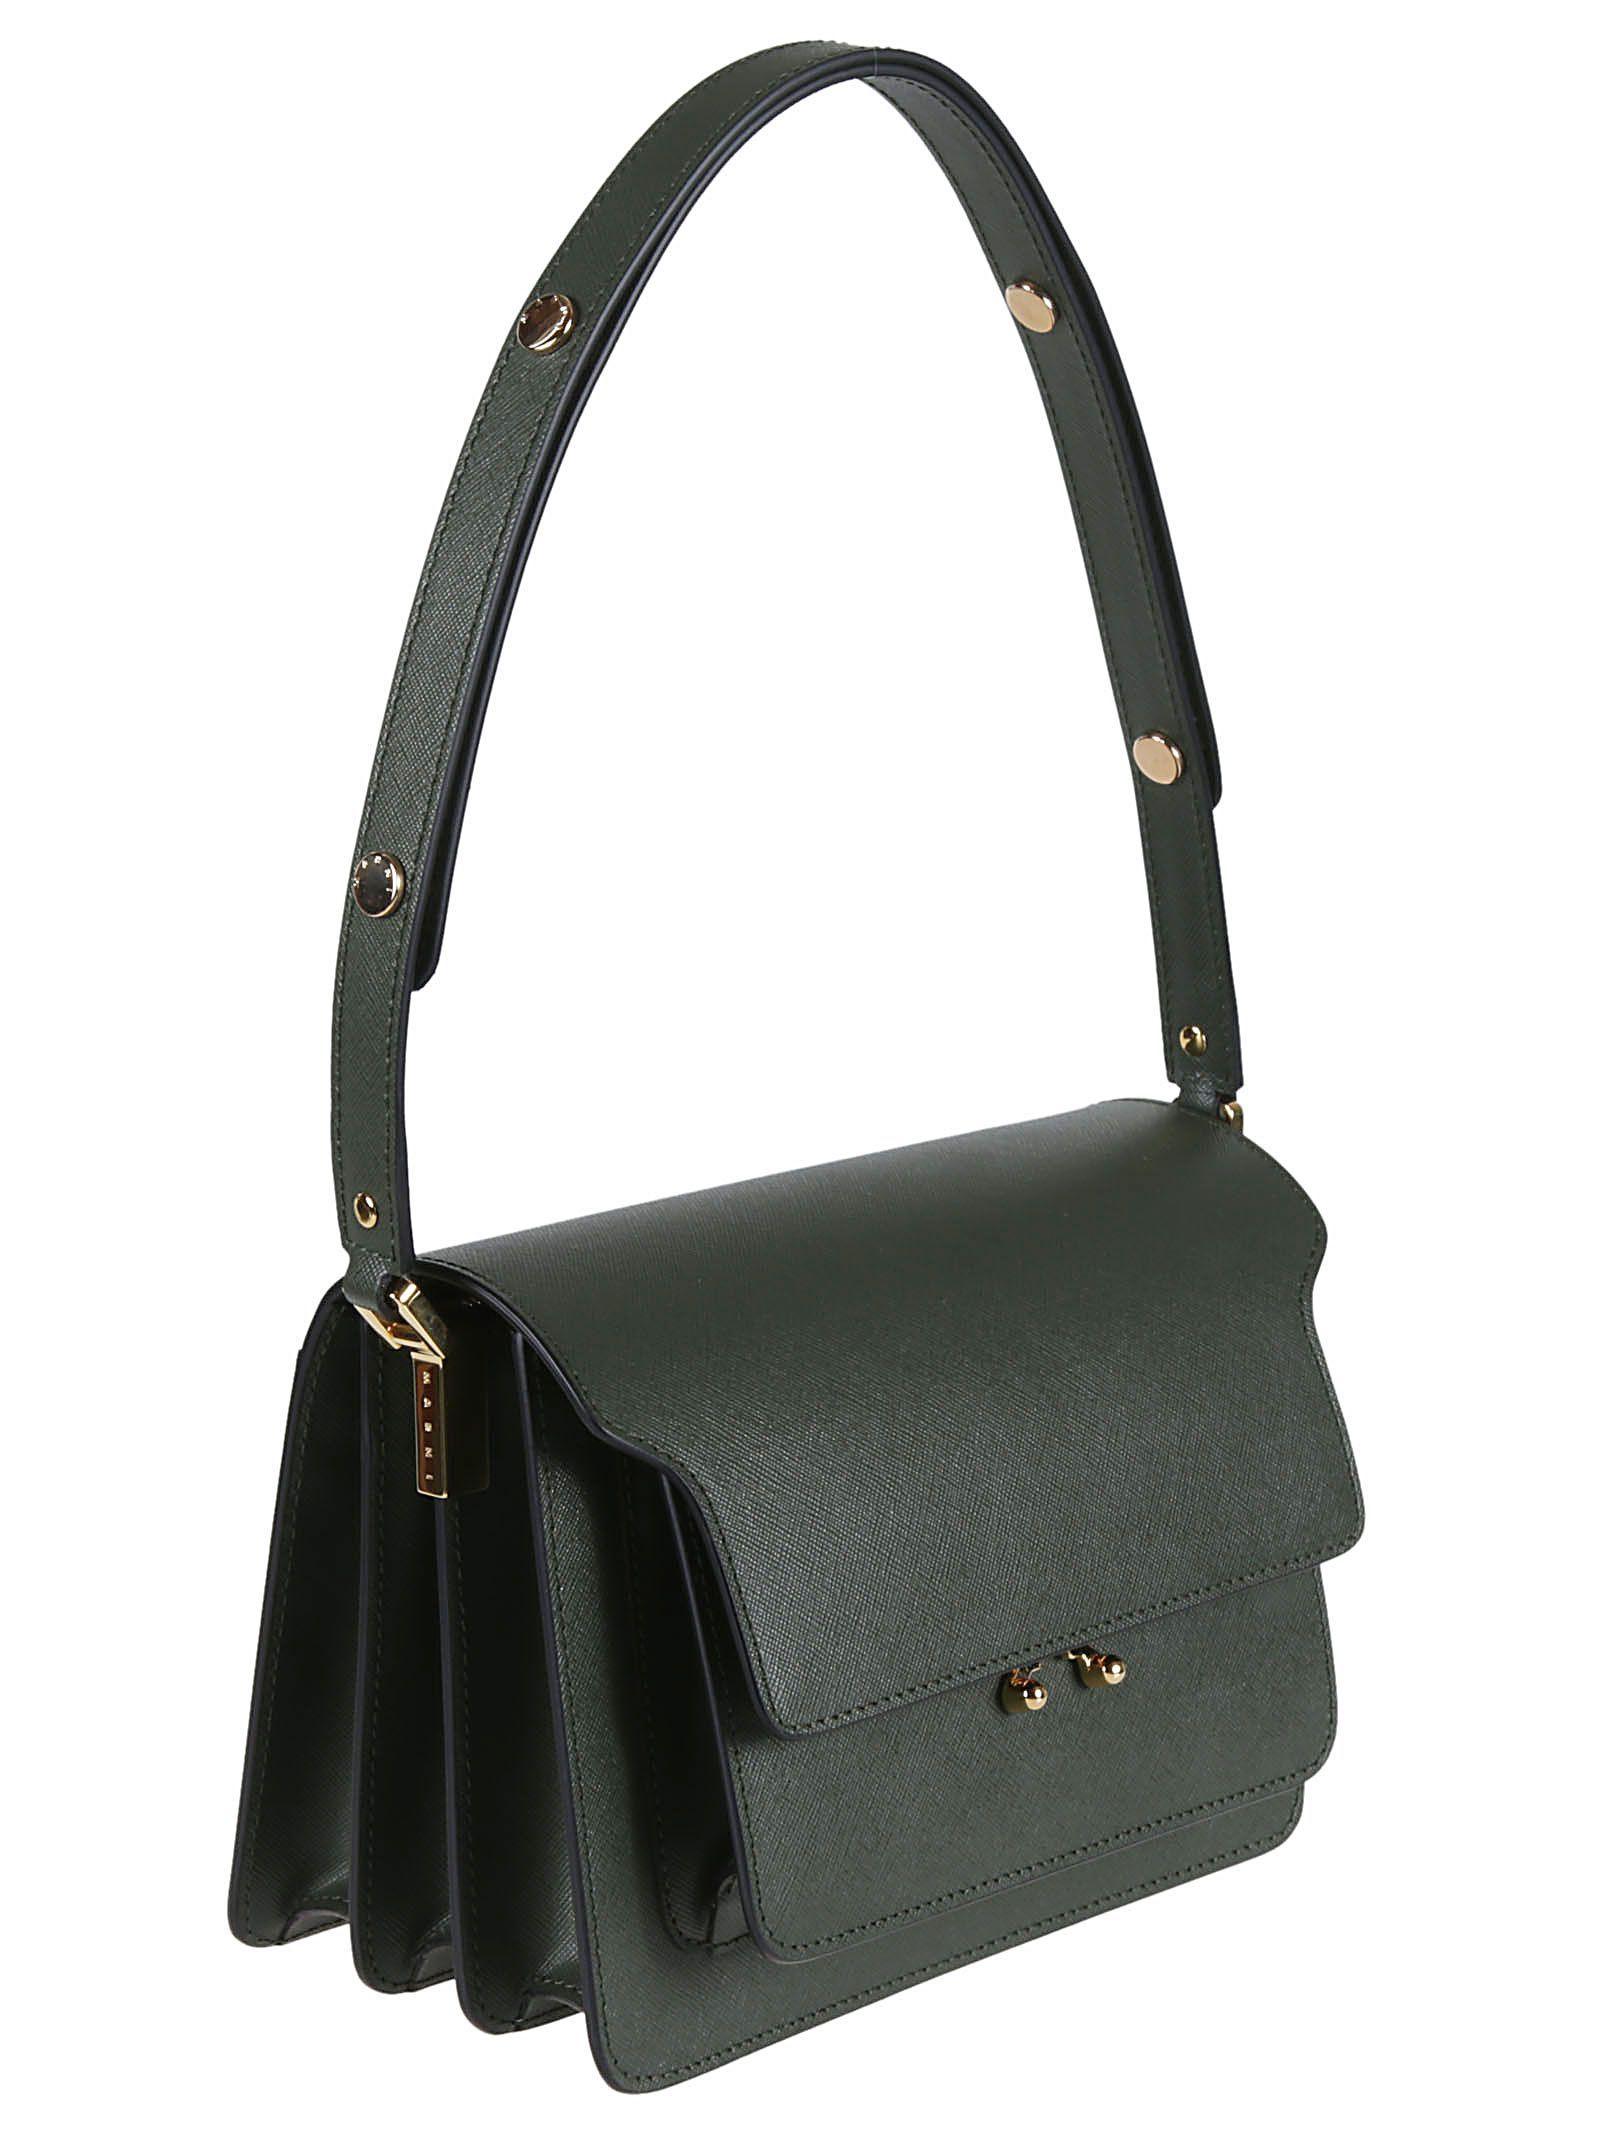 MARNI WOMEN'S SBMPN09NO1LV520ZV55N GREEN LEATHER SHOULDER BAG